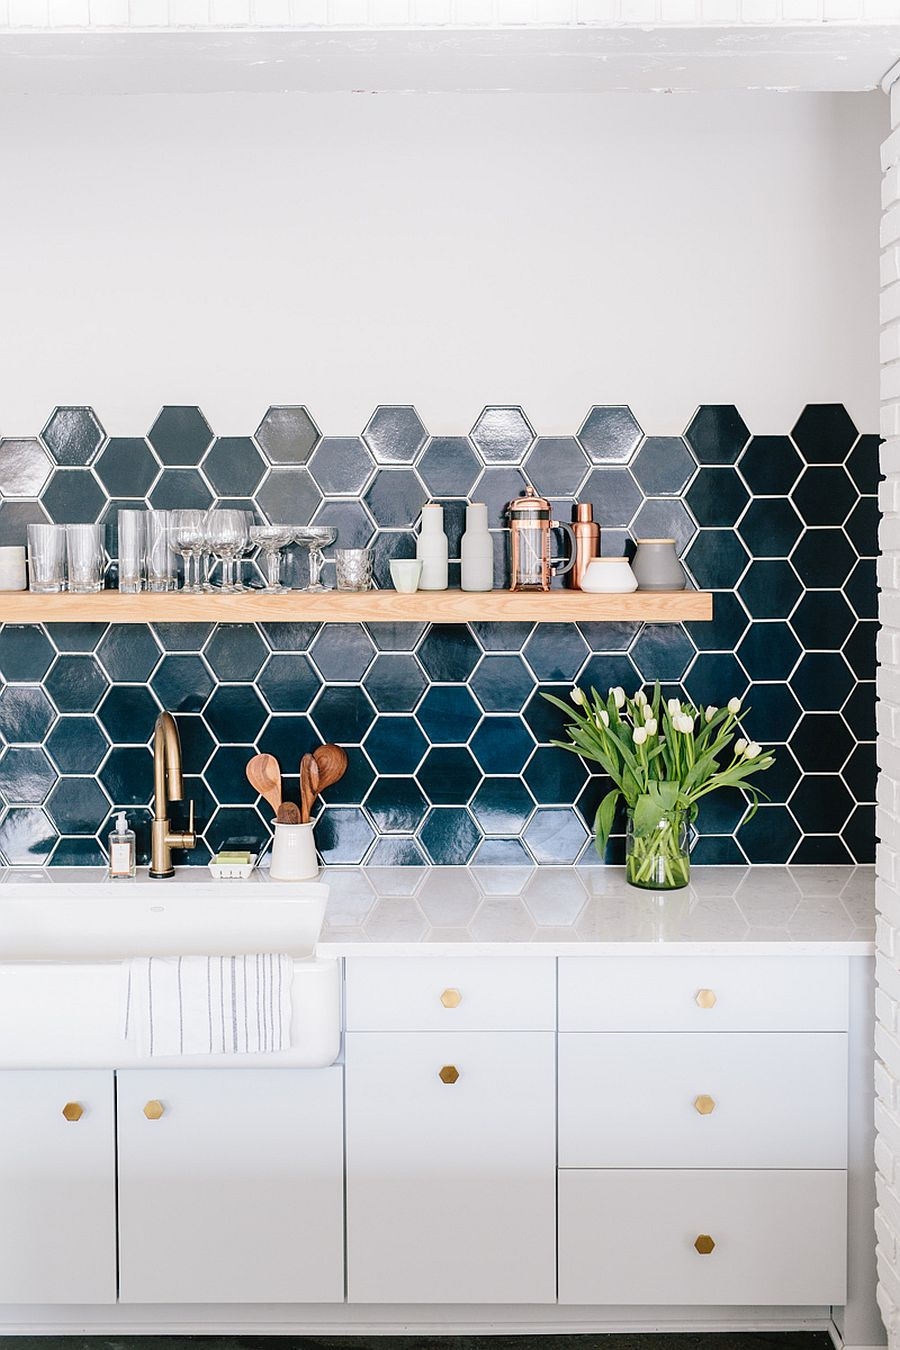 10 Hexagonal Tiles Ideas For Kitchen Backsplash Floor And